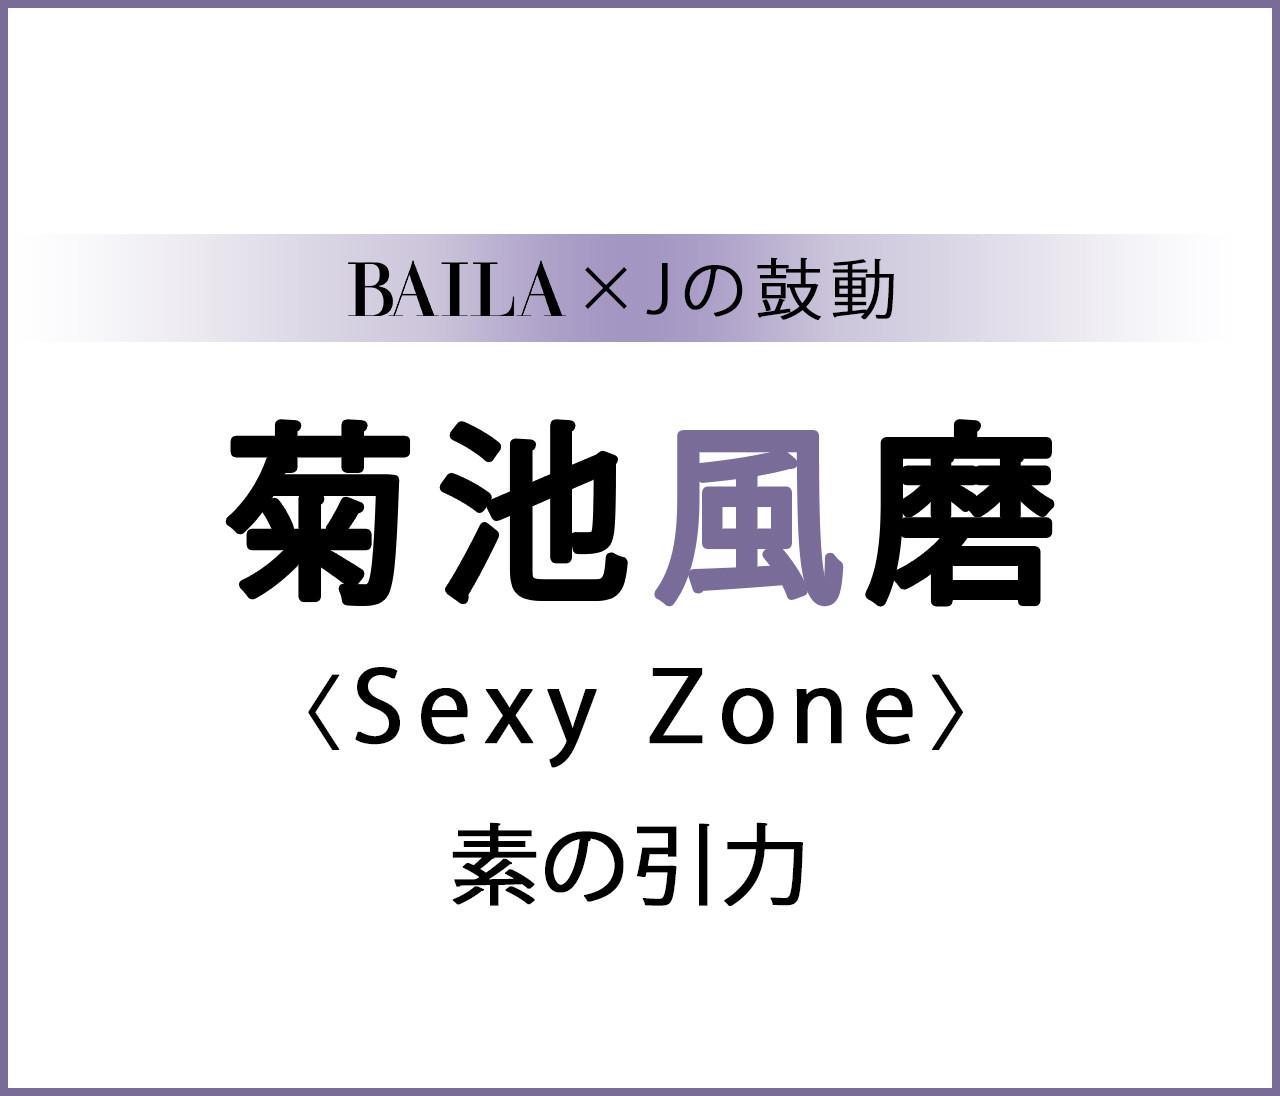 【 #SexyZone #菊池風磨 】Sexy Zone 菊池風磨スペシャルインタビュー<まとめ>【BAILA × Jの鼓動】